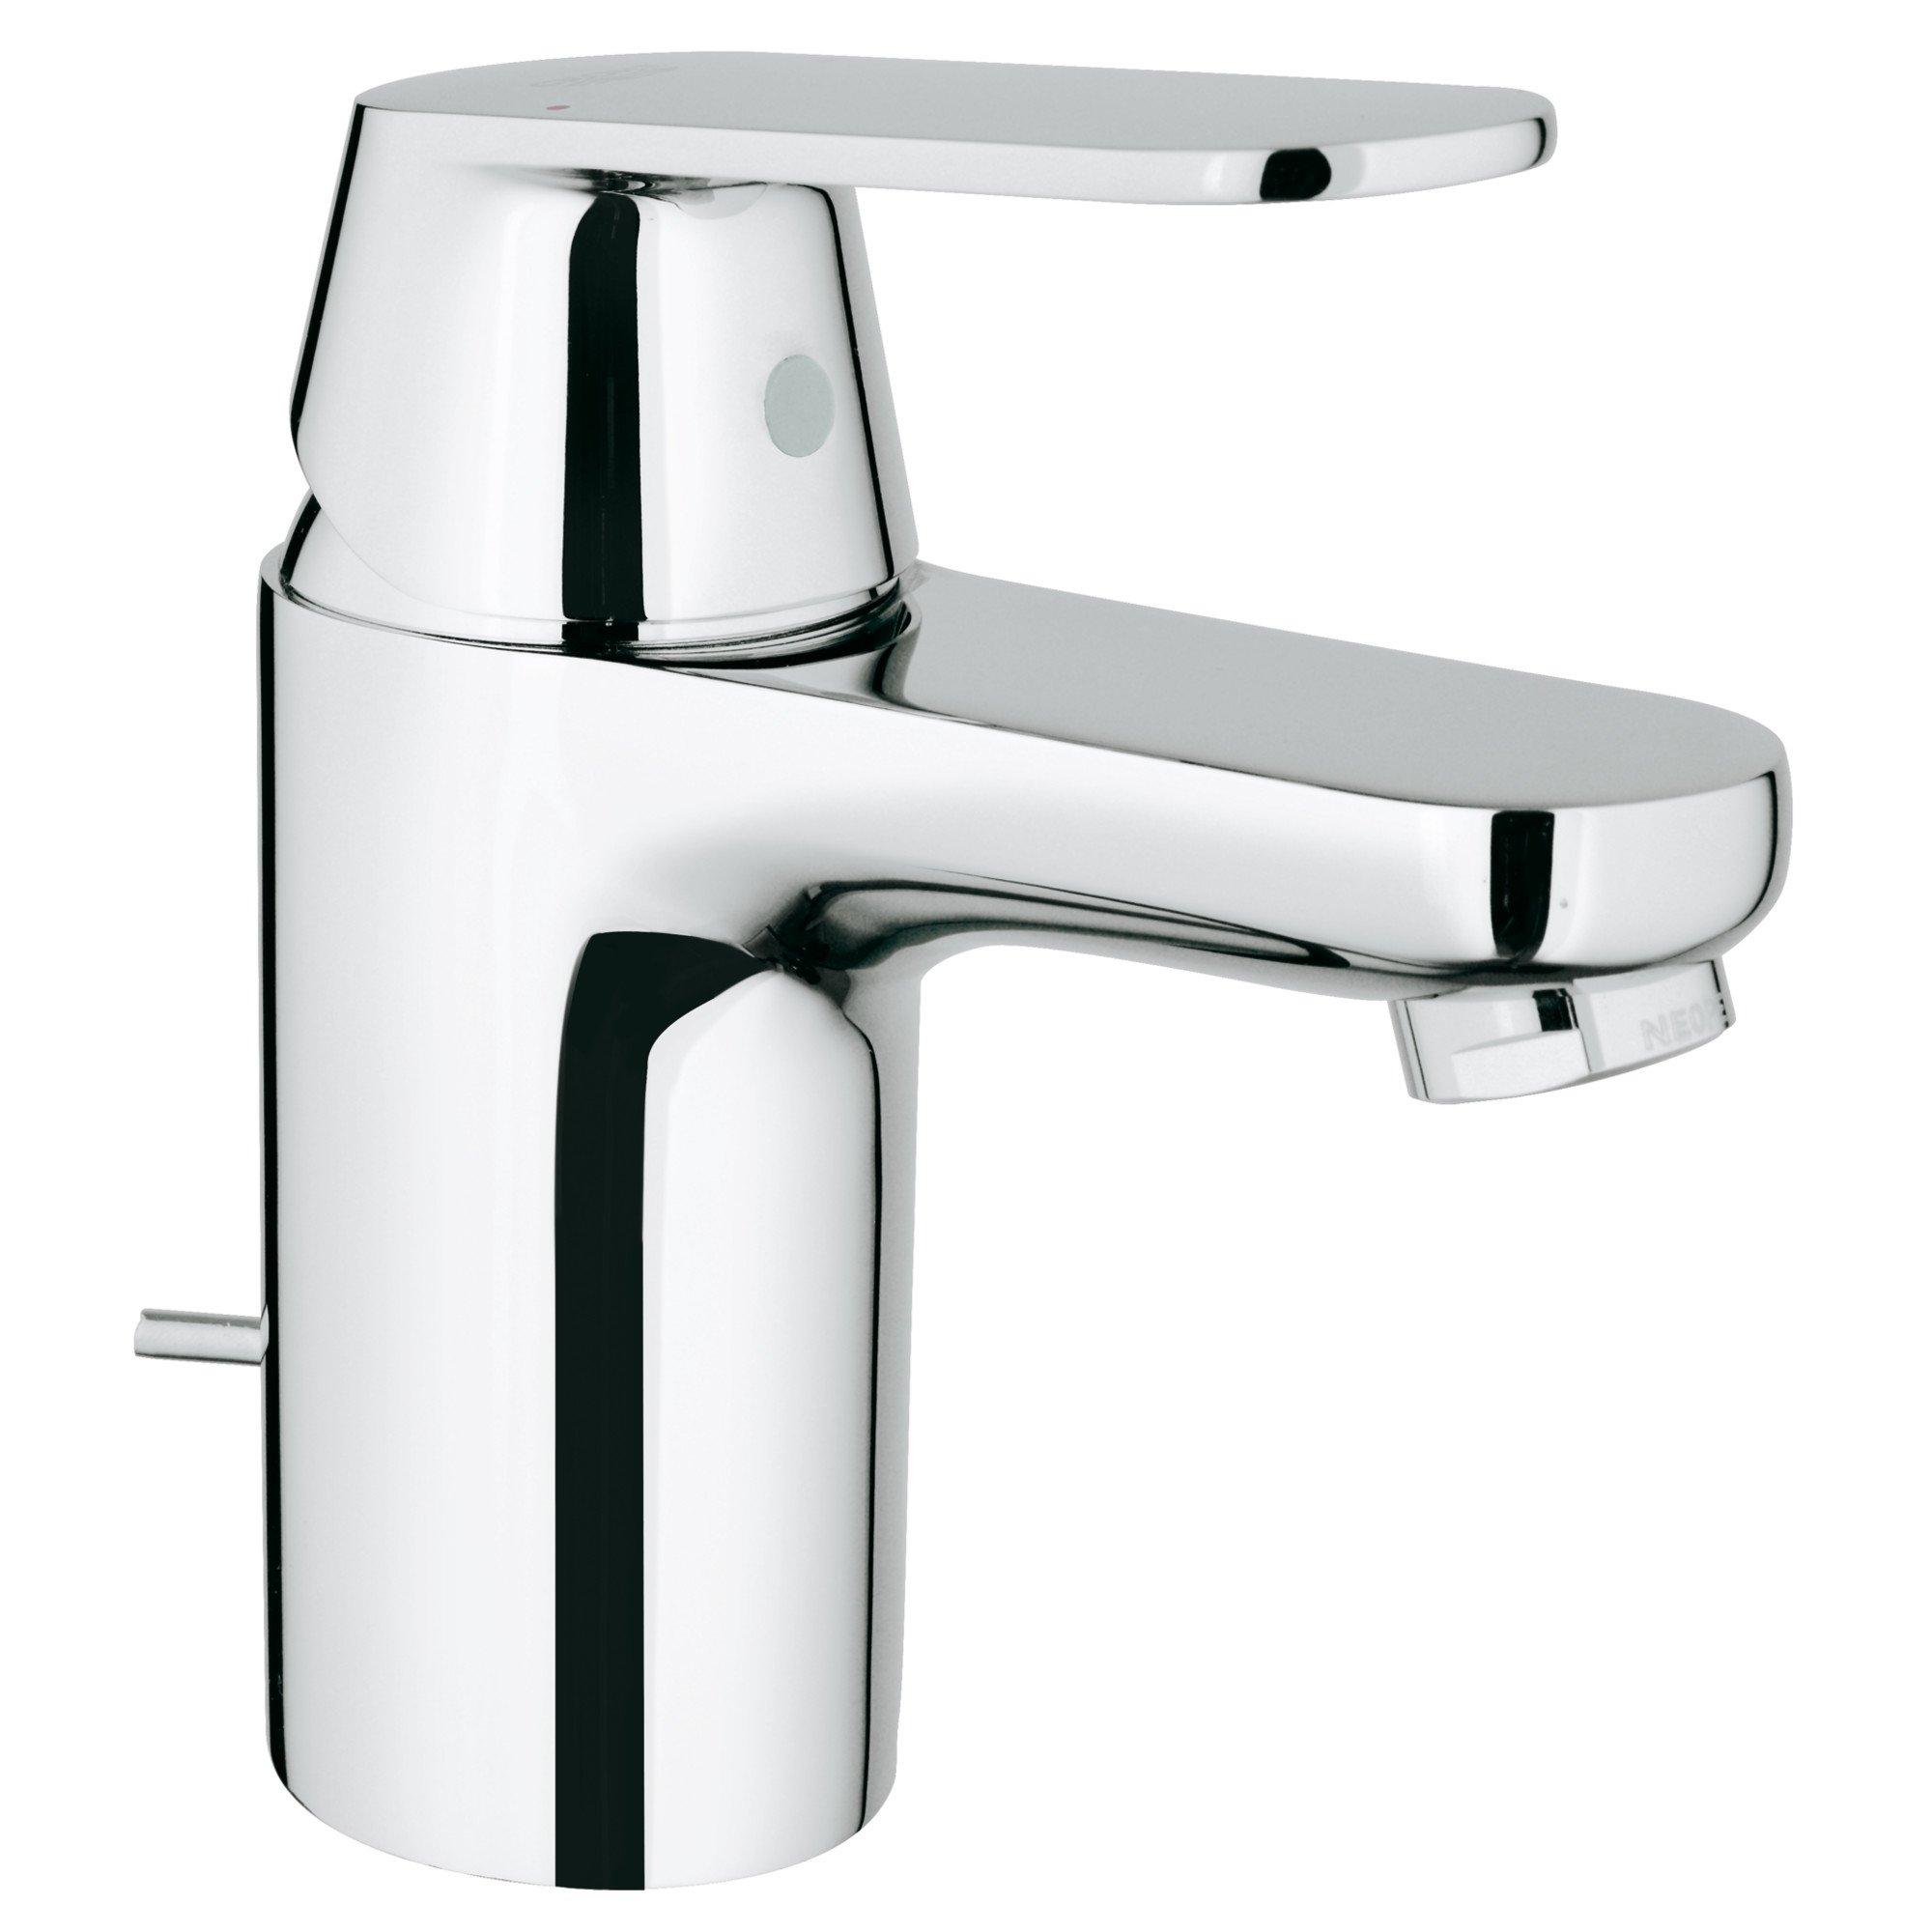 GROHE Bathroom Faucet: Amazon.ca